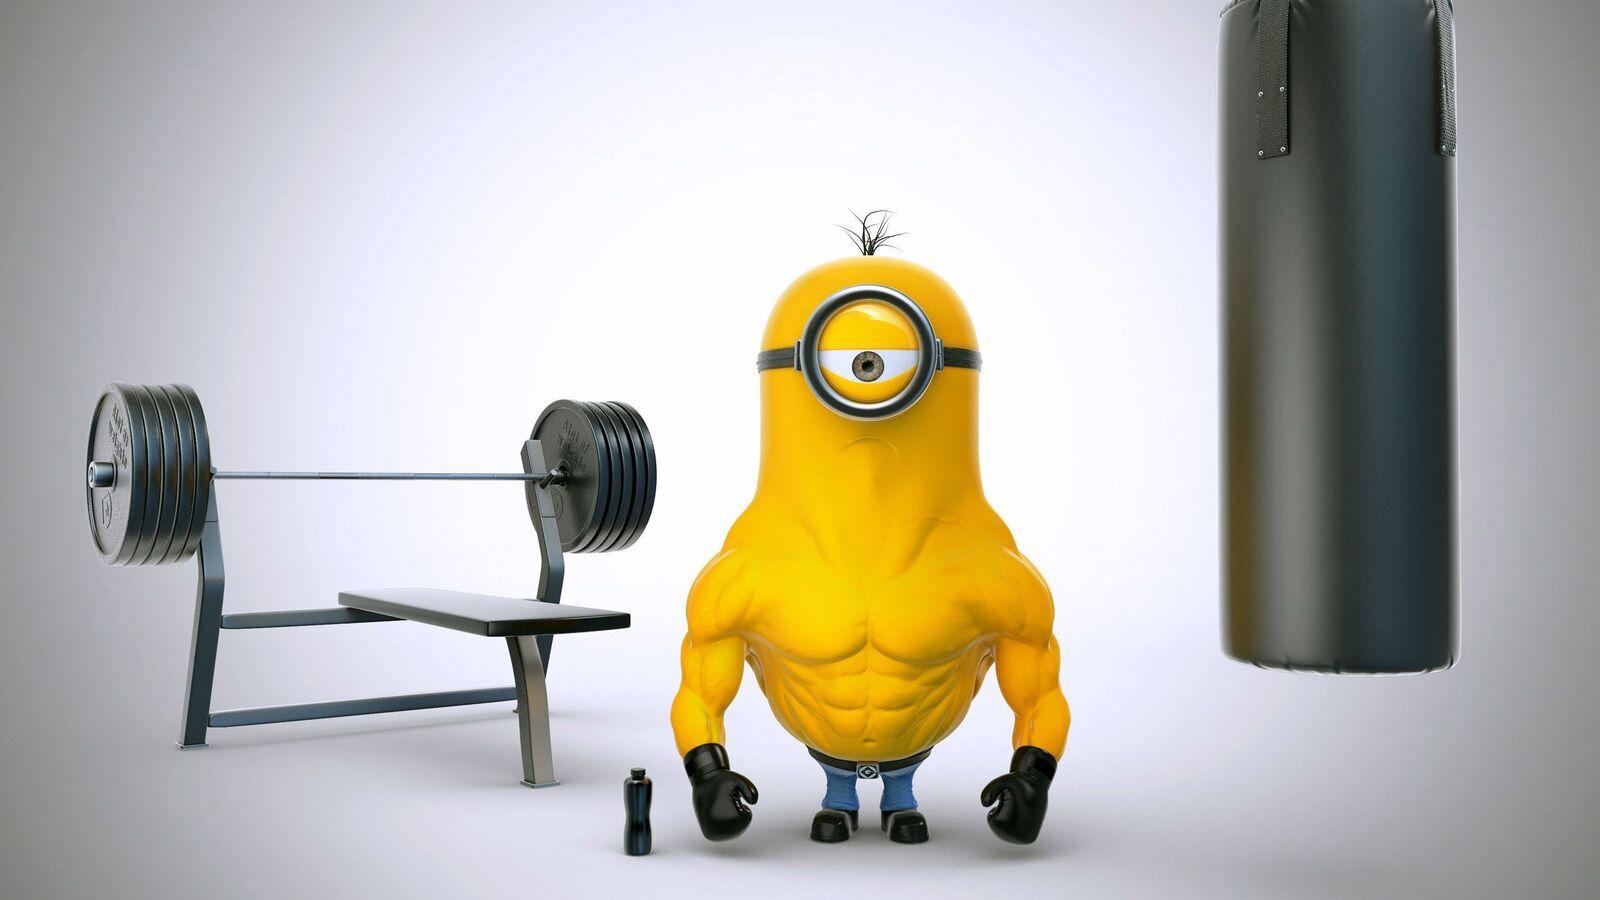 bodybuilder-minions-yellow-hd.jpg